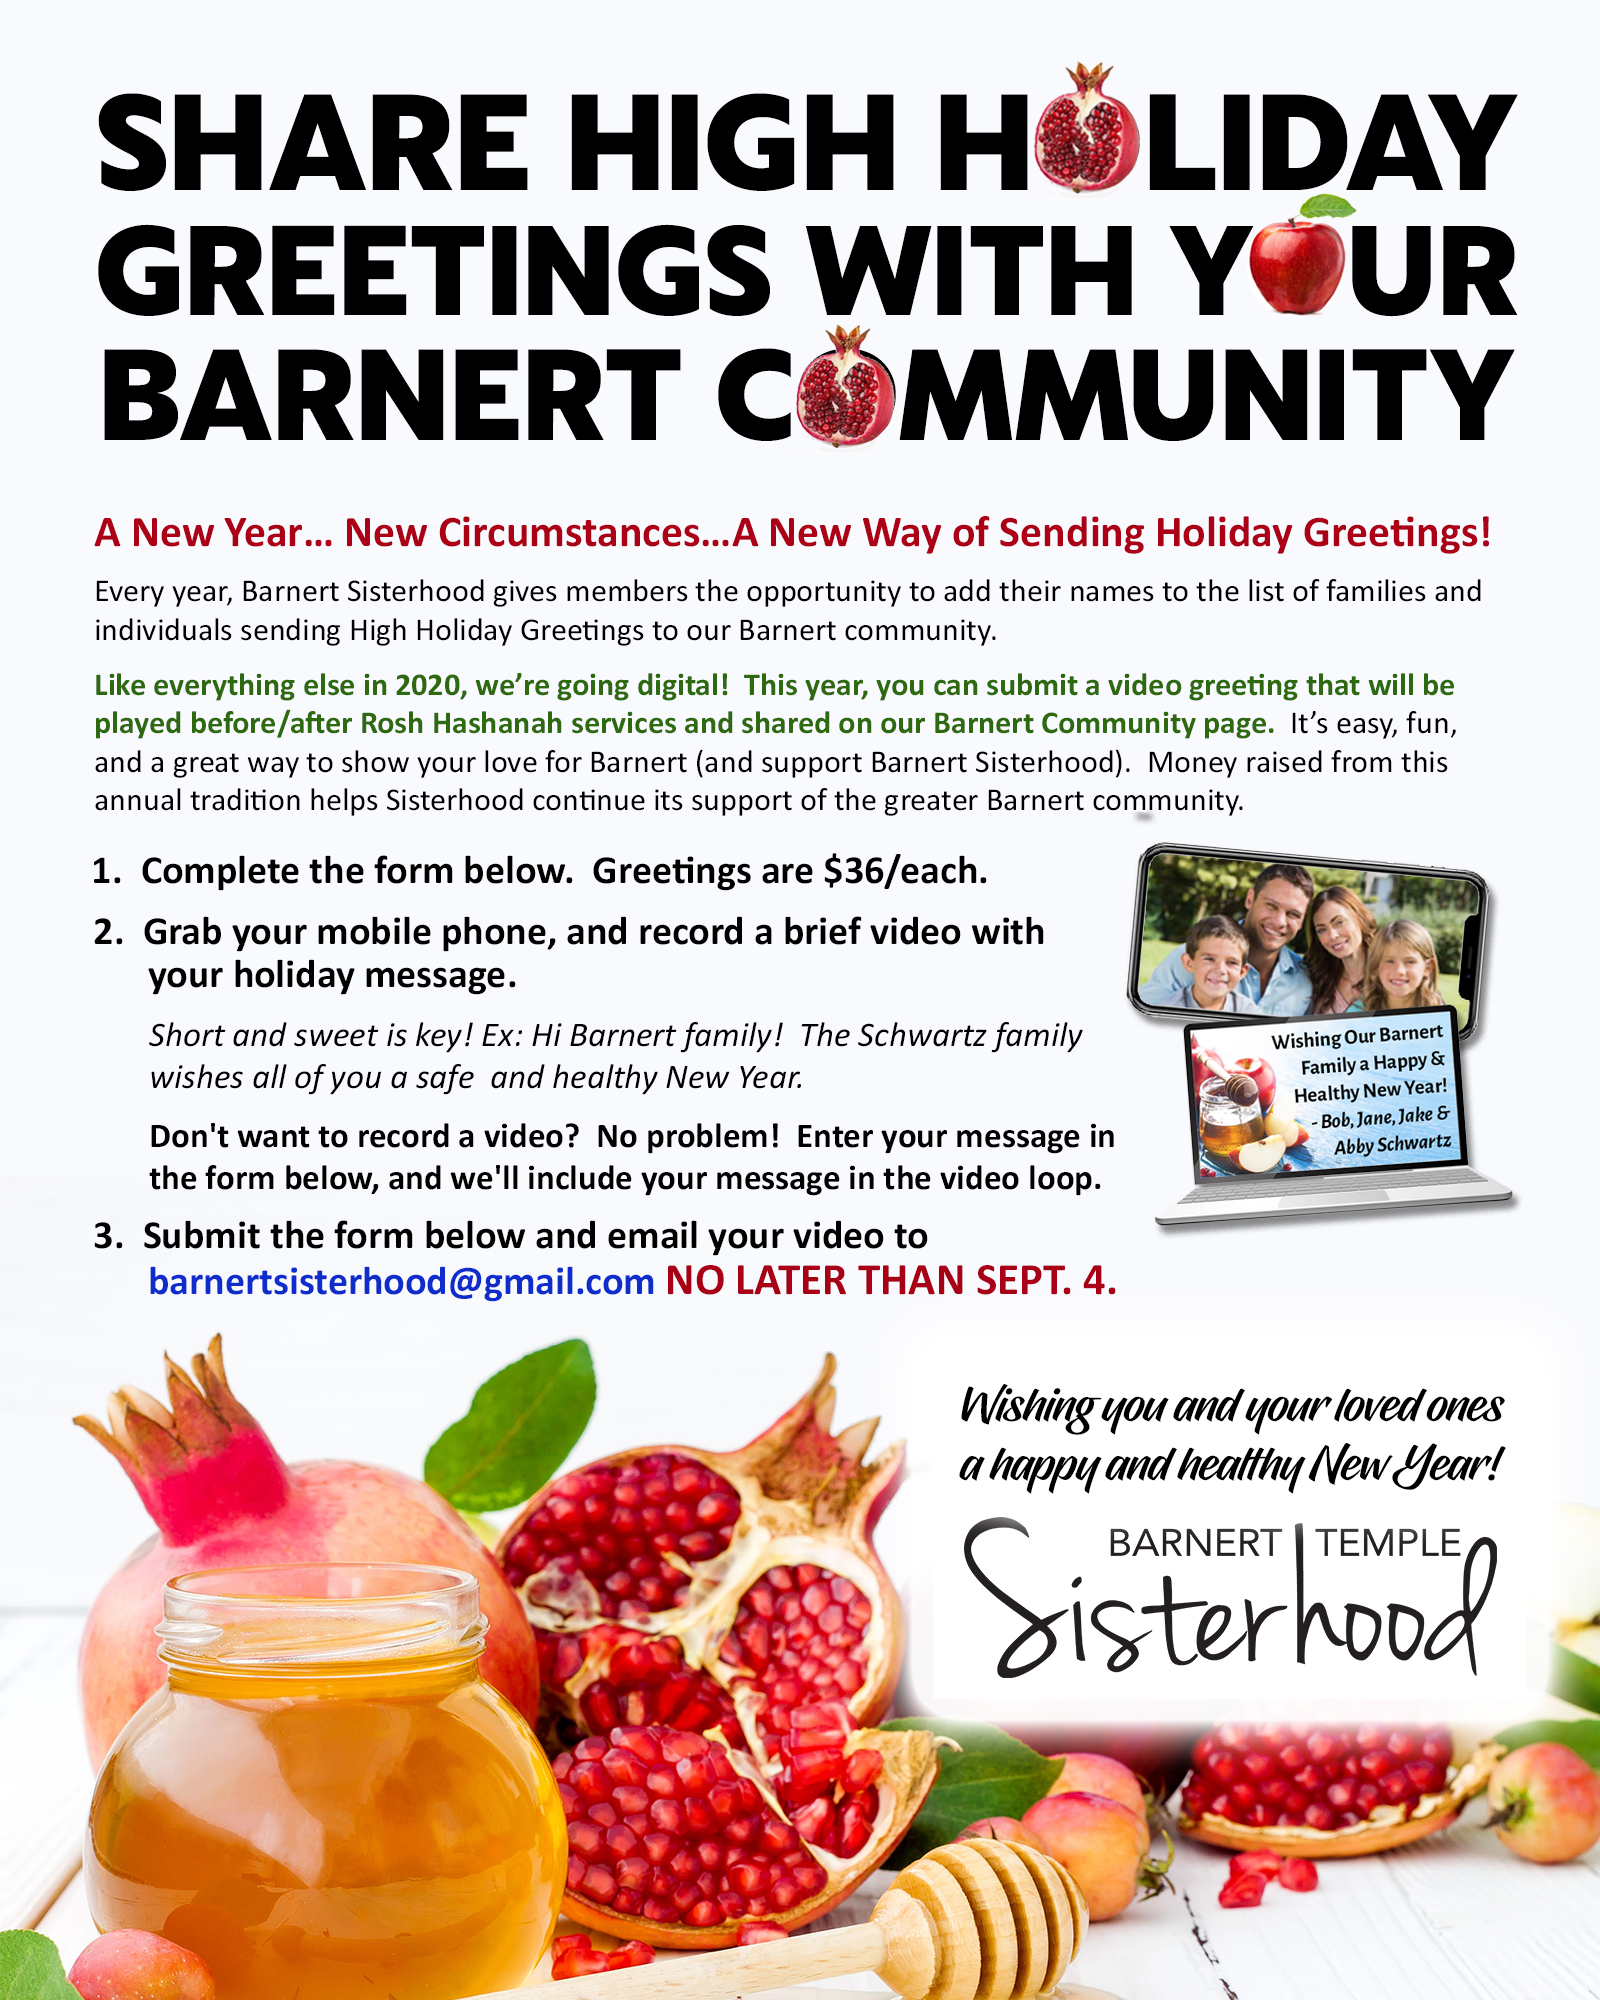 Barnert Sisterhood High Holiday Greetings Ad